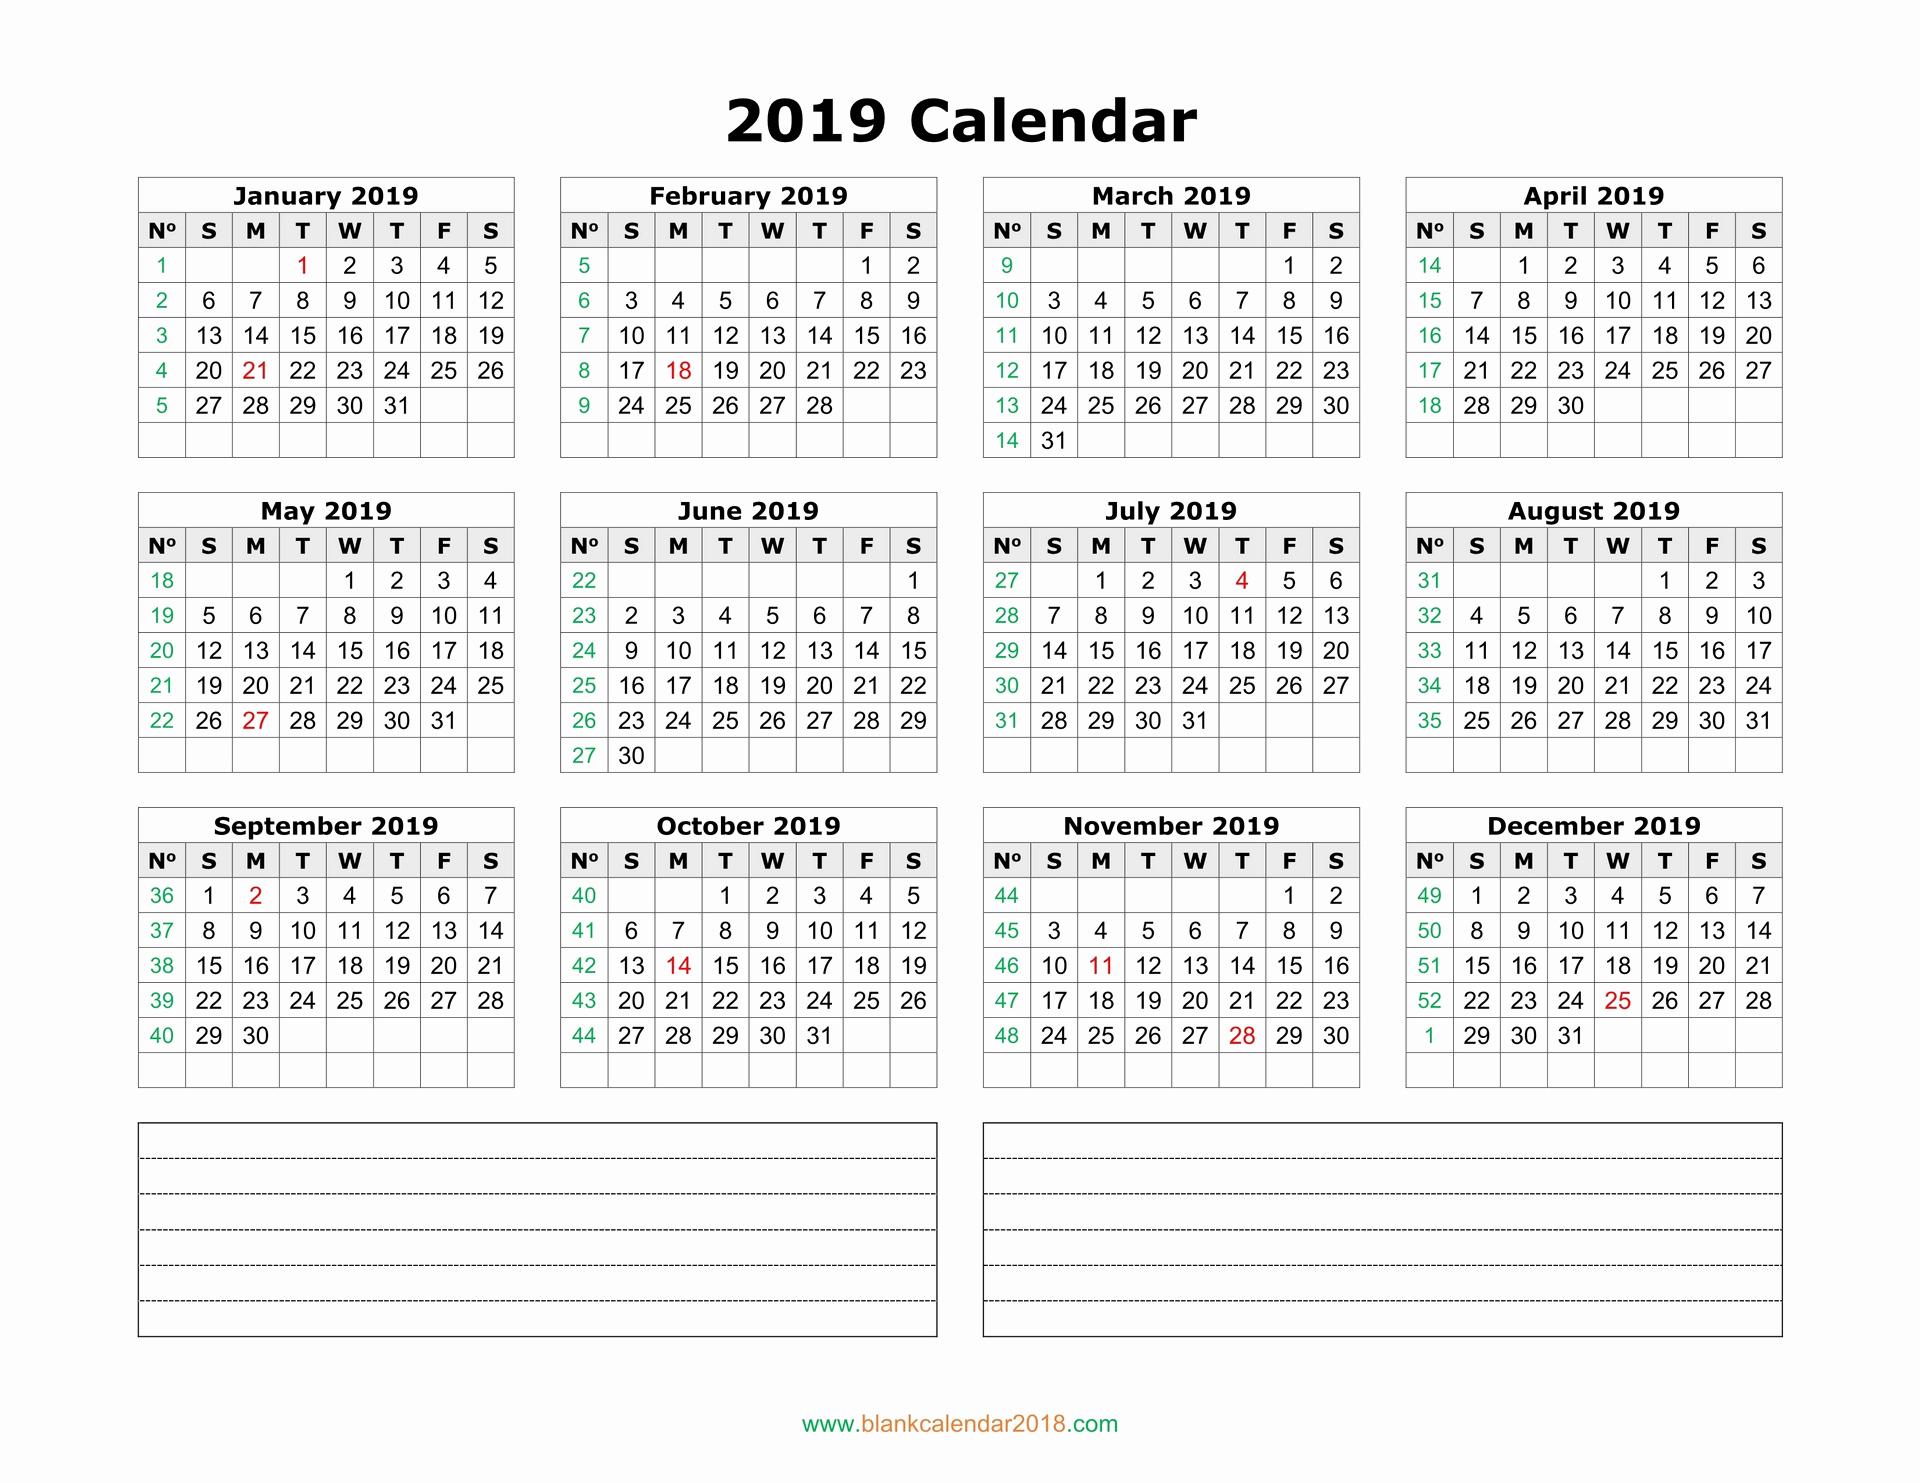 Blank Calendar Template 2019 Elegant Blank Calendar 2019